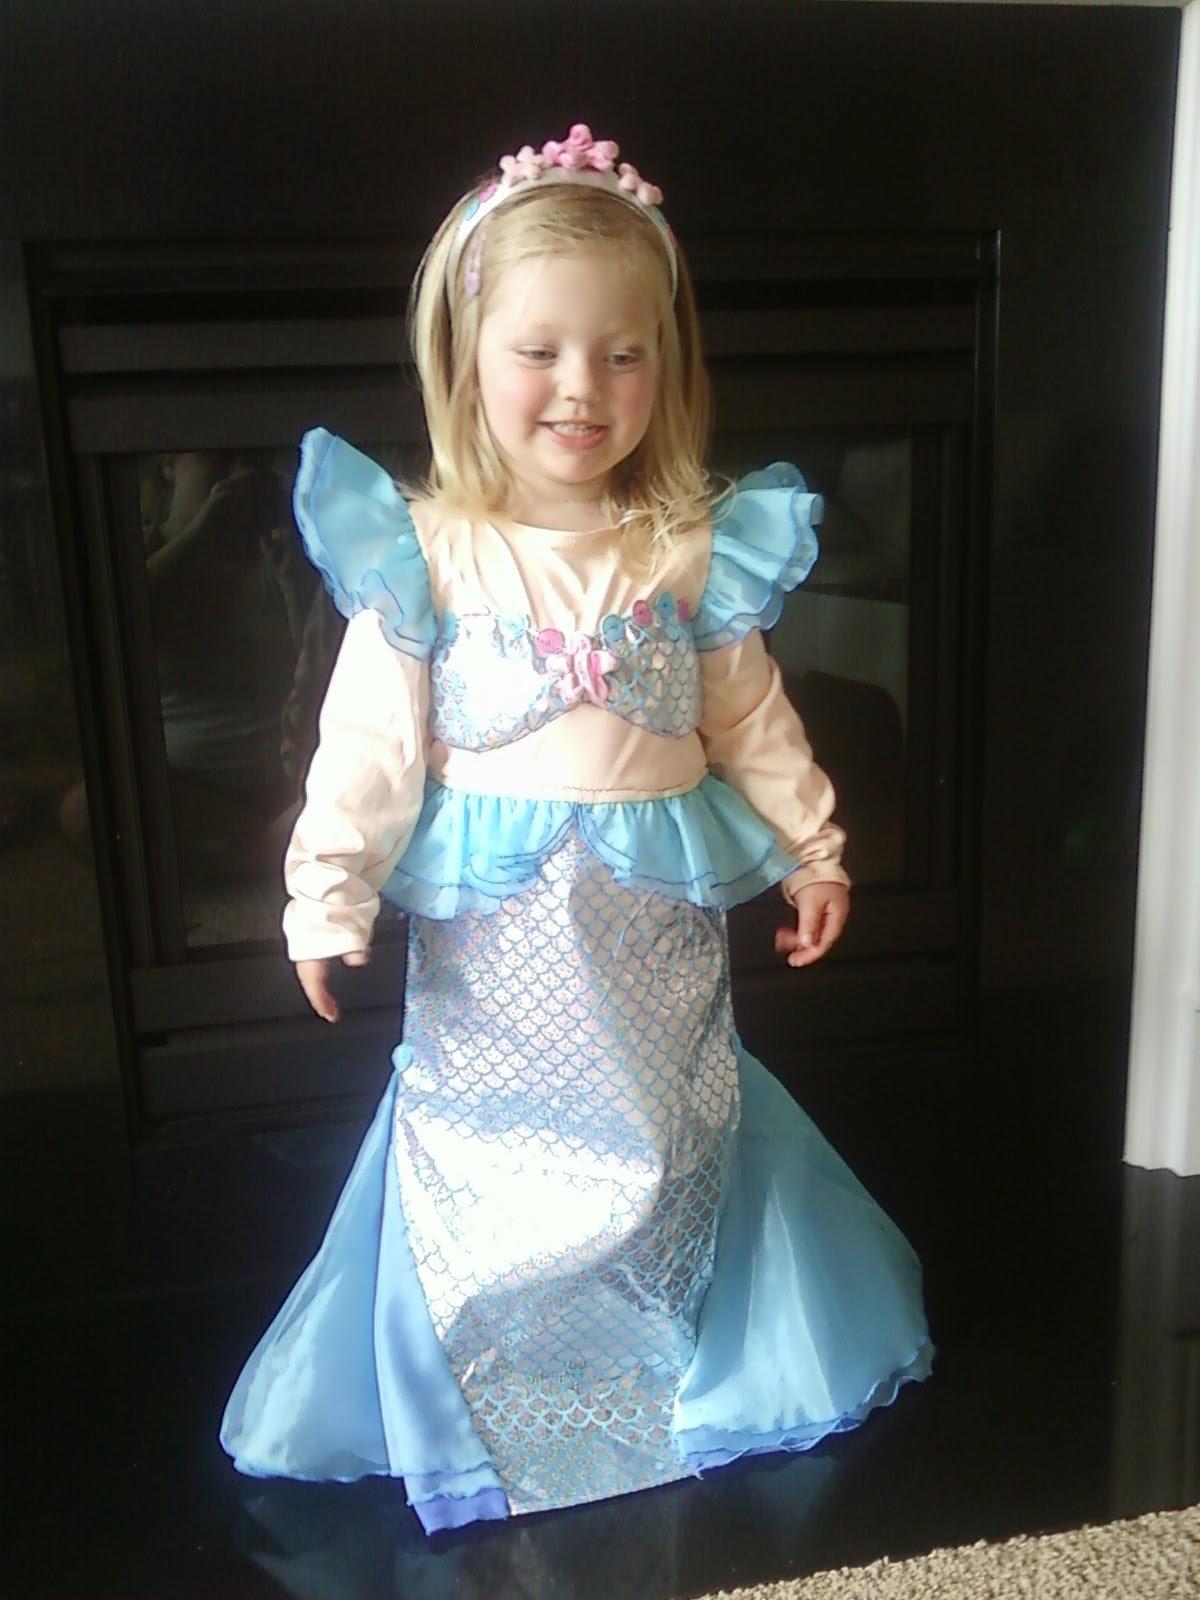 http://3.bp.blogspot.com/-BLybNEASkoc/TfzO2z1qIfI/AAAAAAAAAQI/kwKxuLj-MxI/s1600/mermaid.jpg